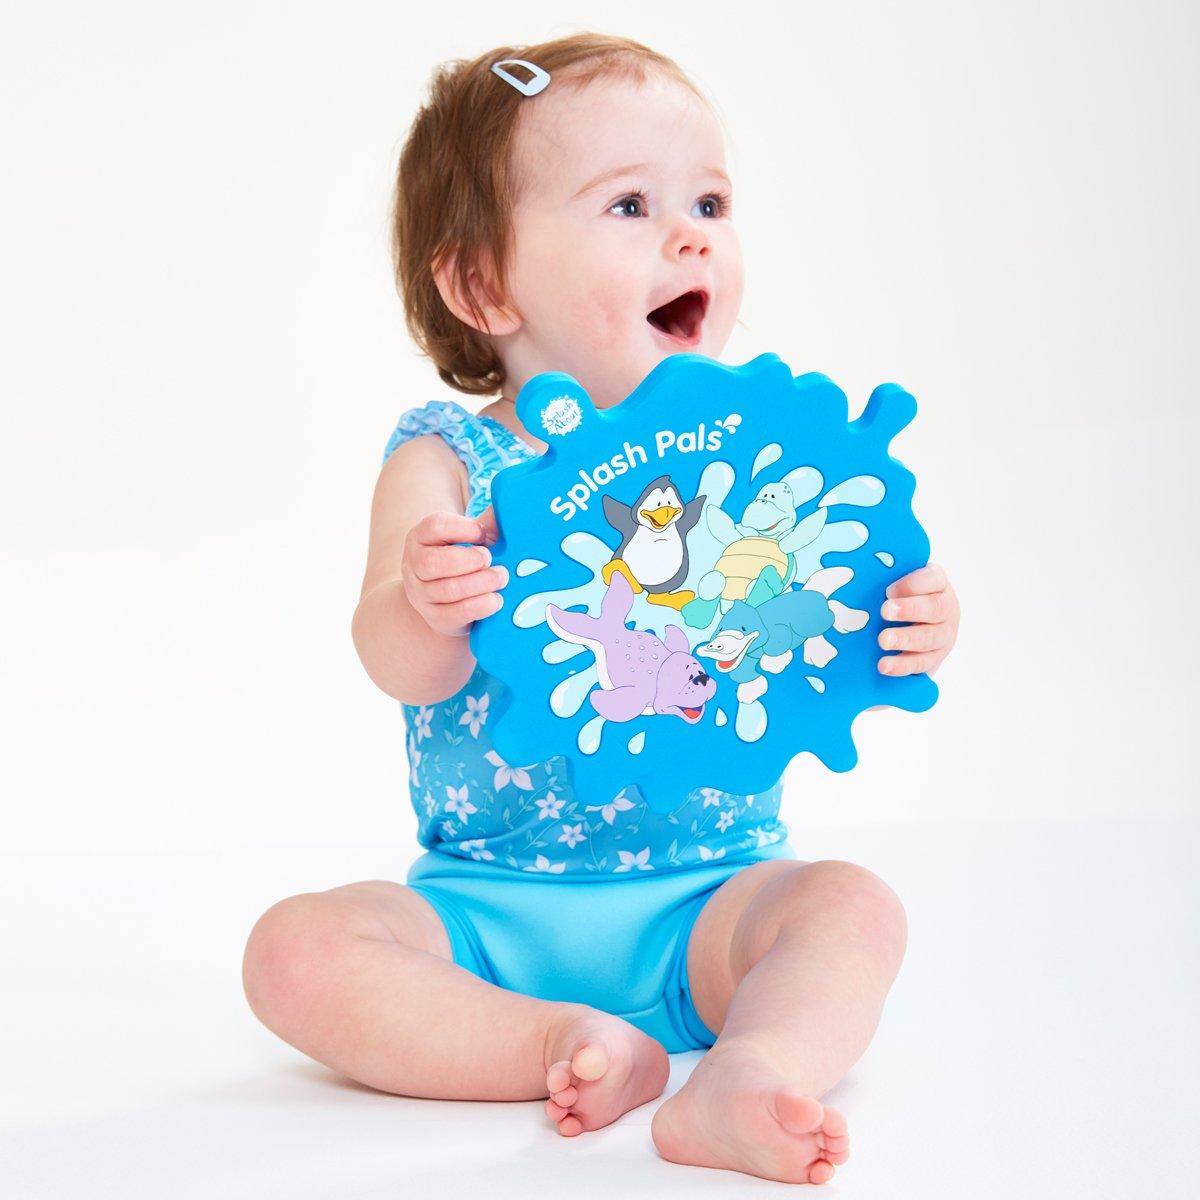 Splash About Babies\' Swim and Bath Mirror - Splash Pals: Amazon.co ...